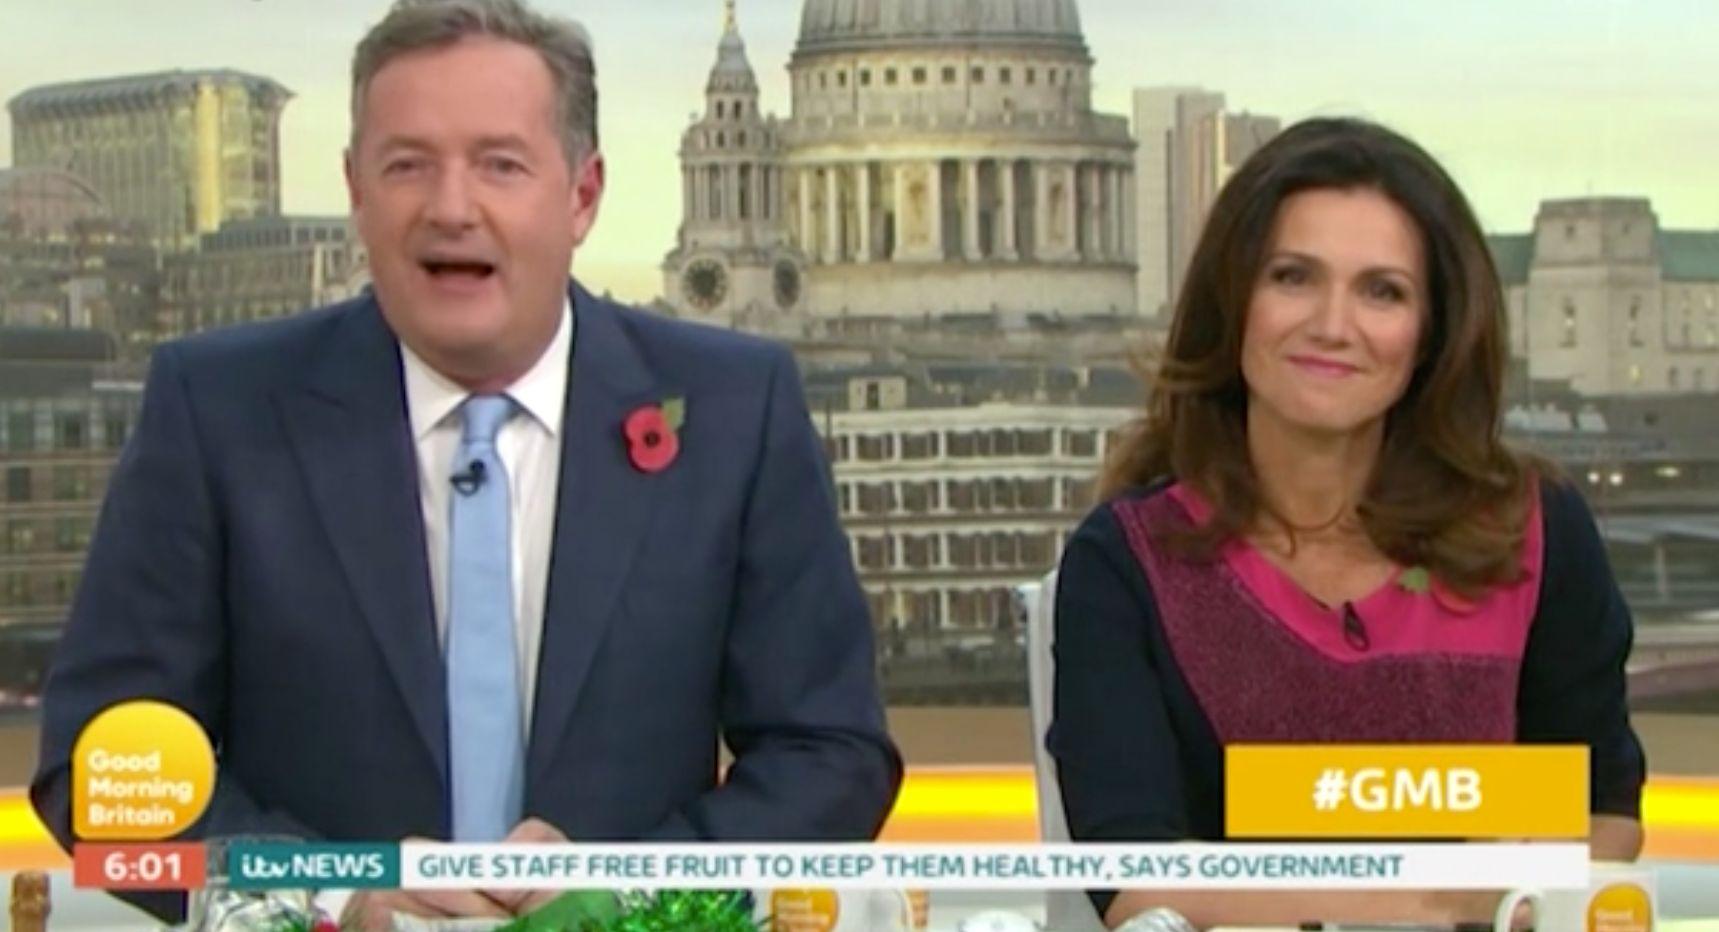 Piers Morgan Teases Susanna Reid After She Goes Public With Steve Parish Romance